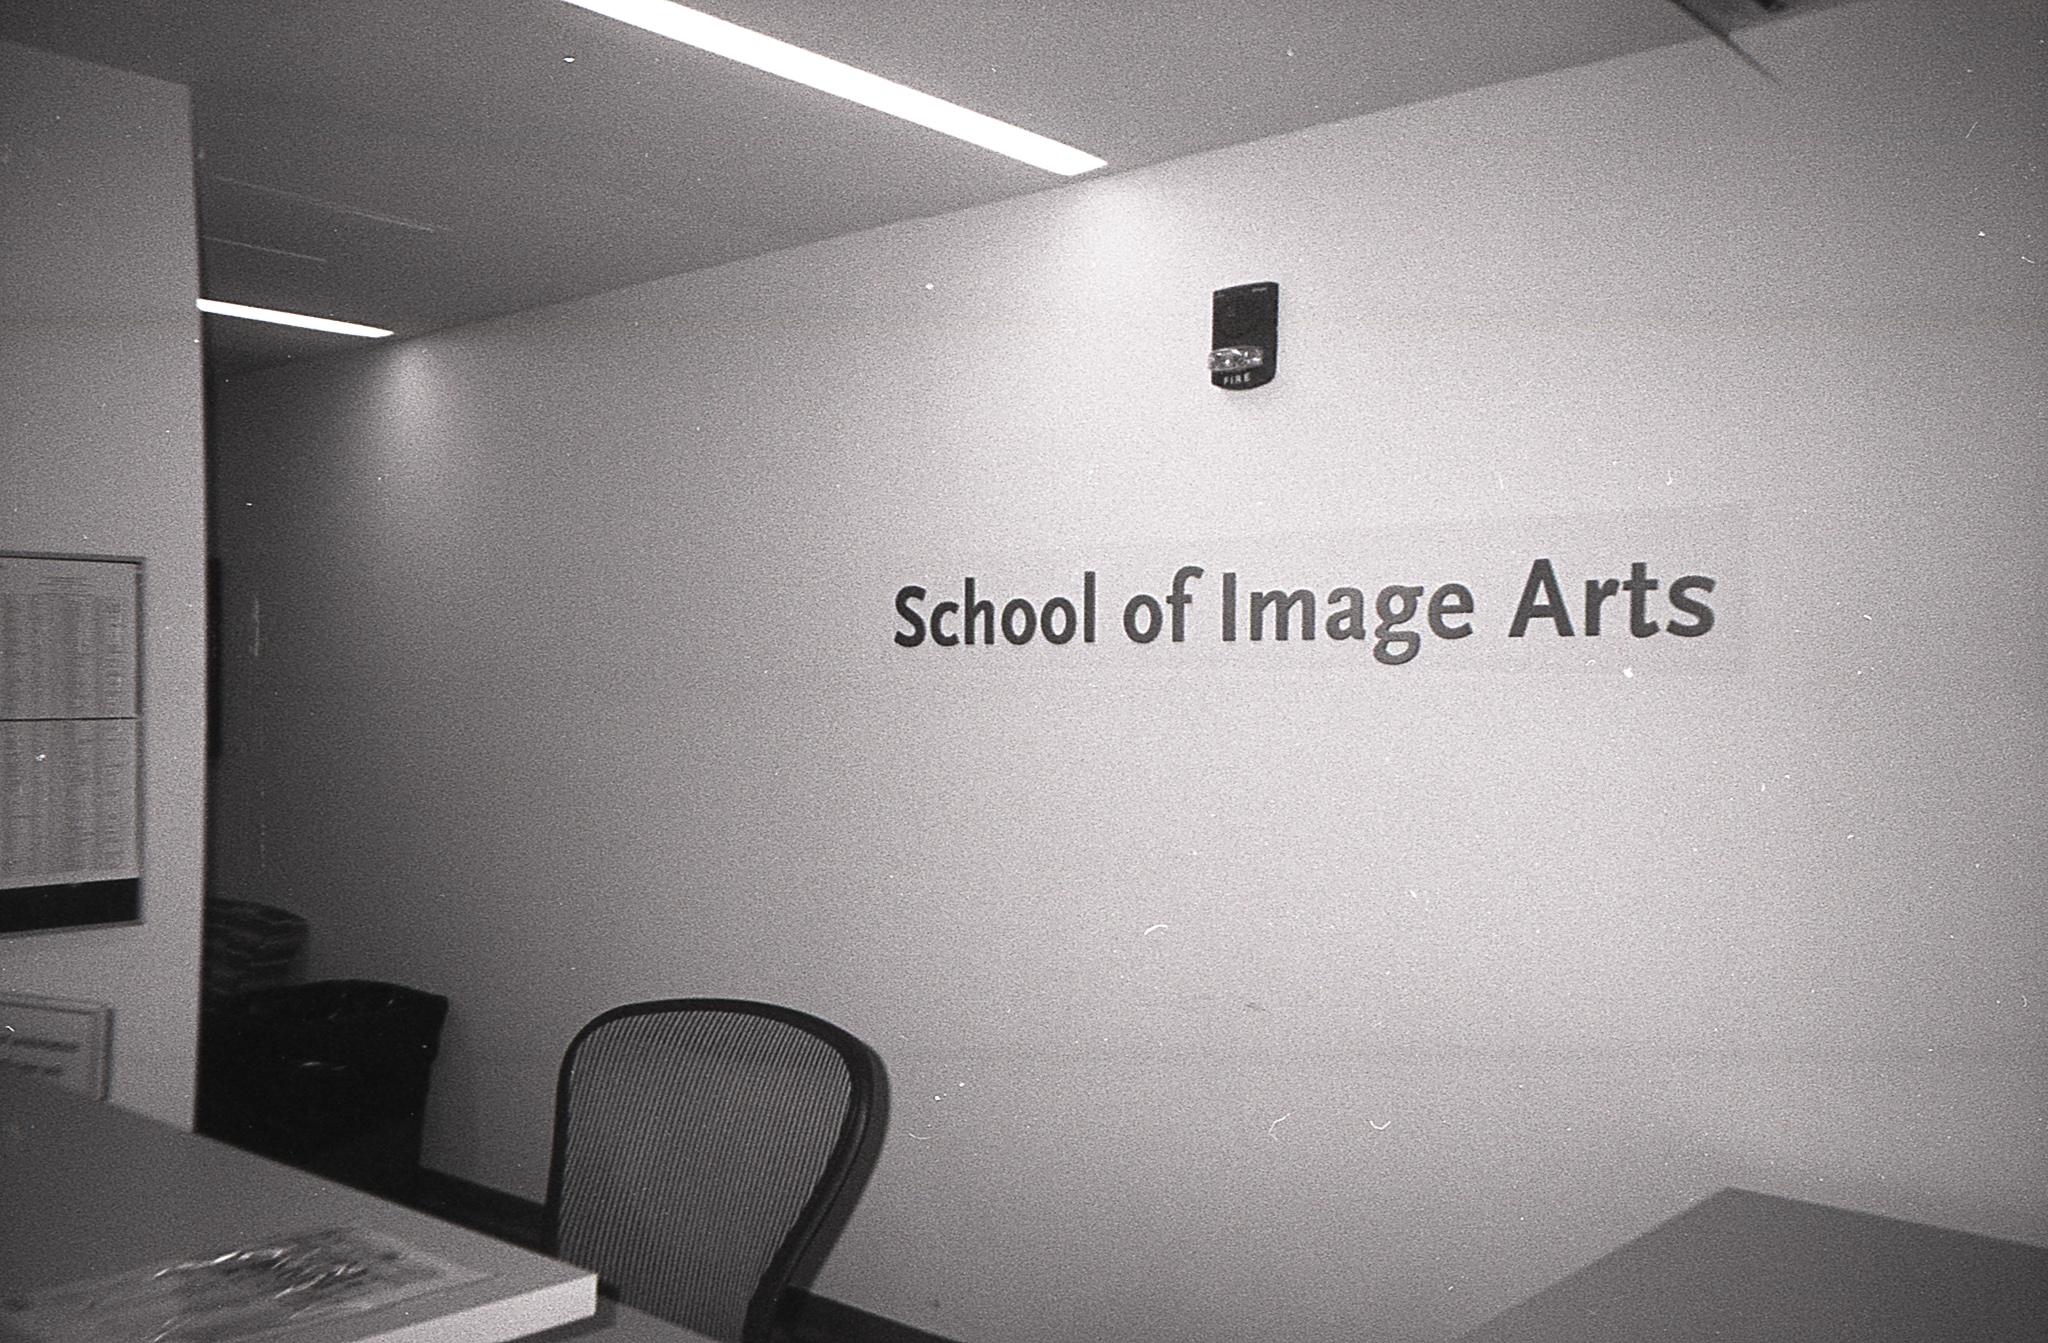 Ryerson School of Image Arts Front Desk - Kodak Tri-X 400